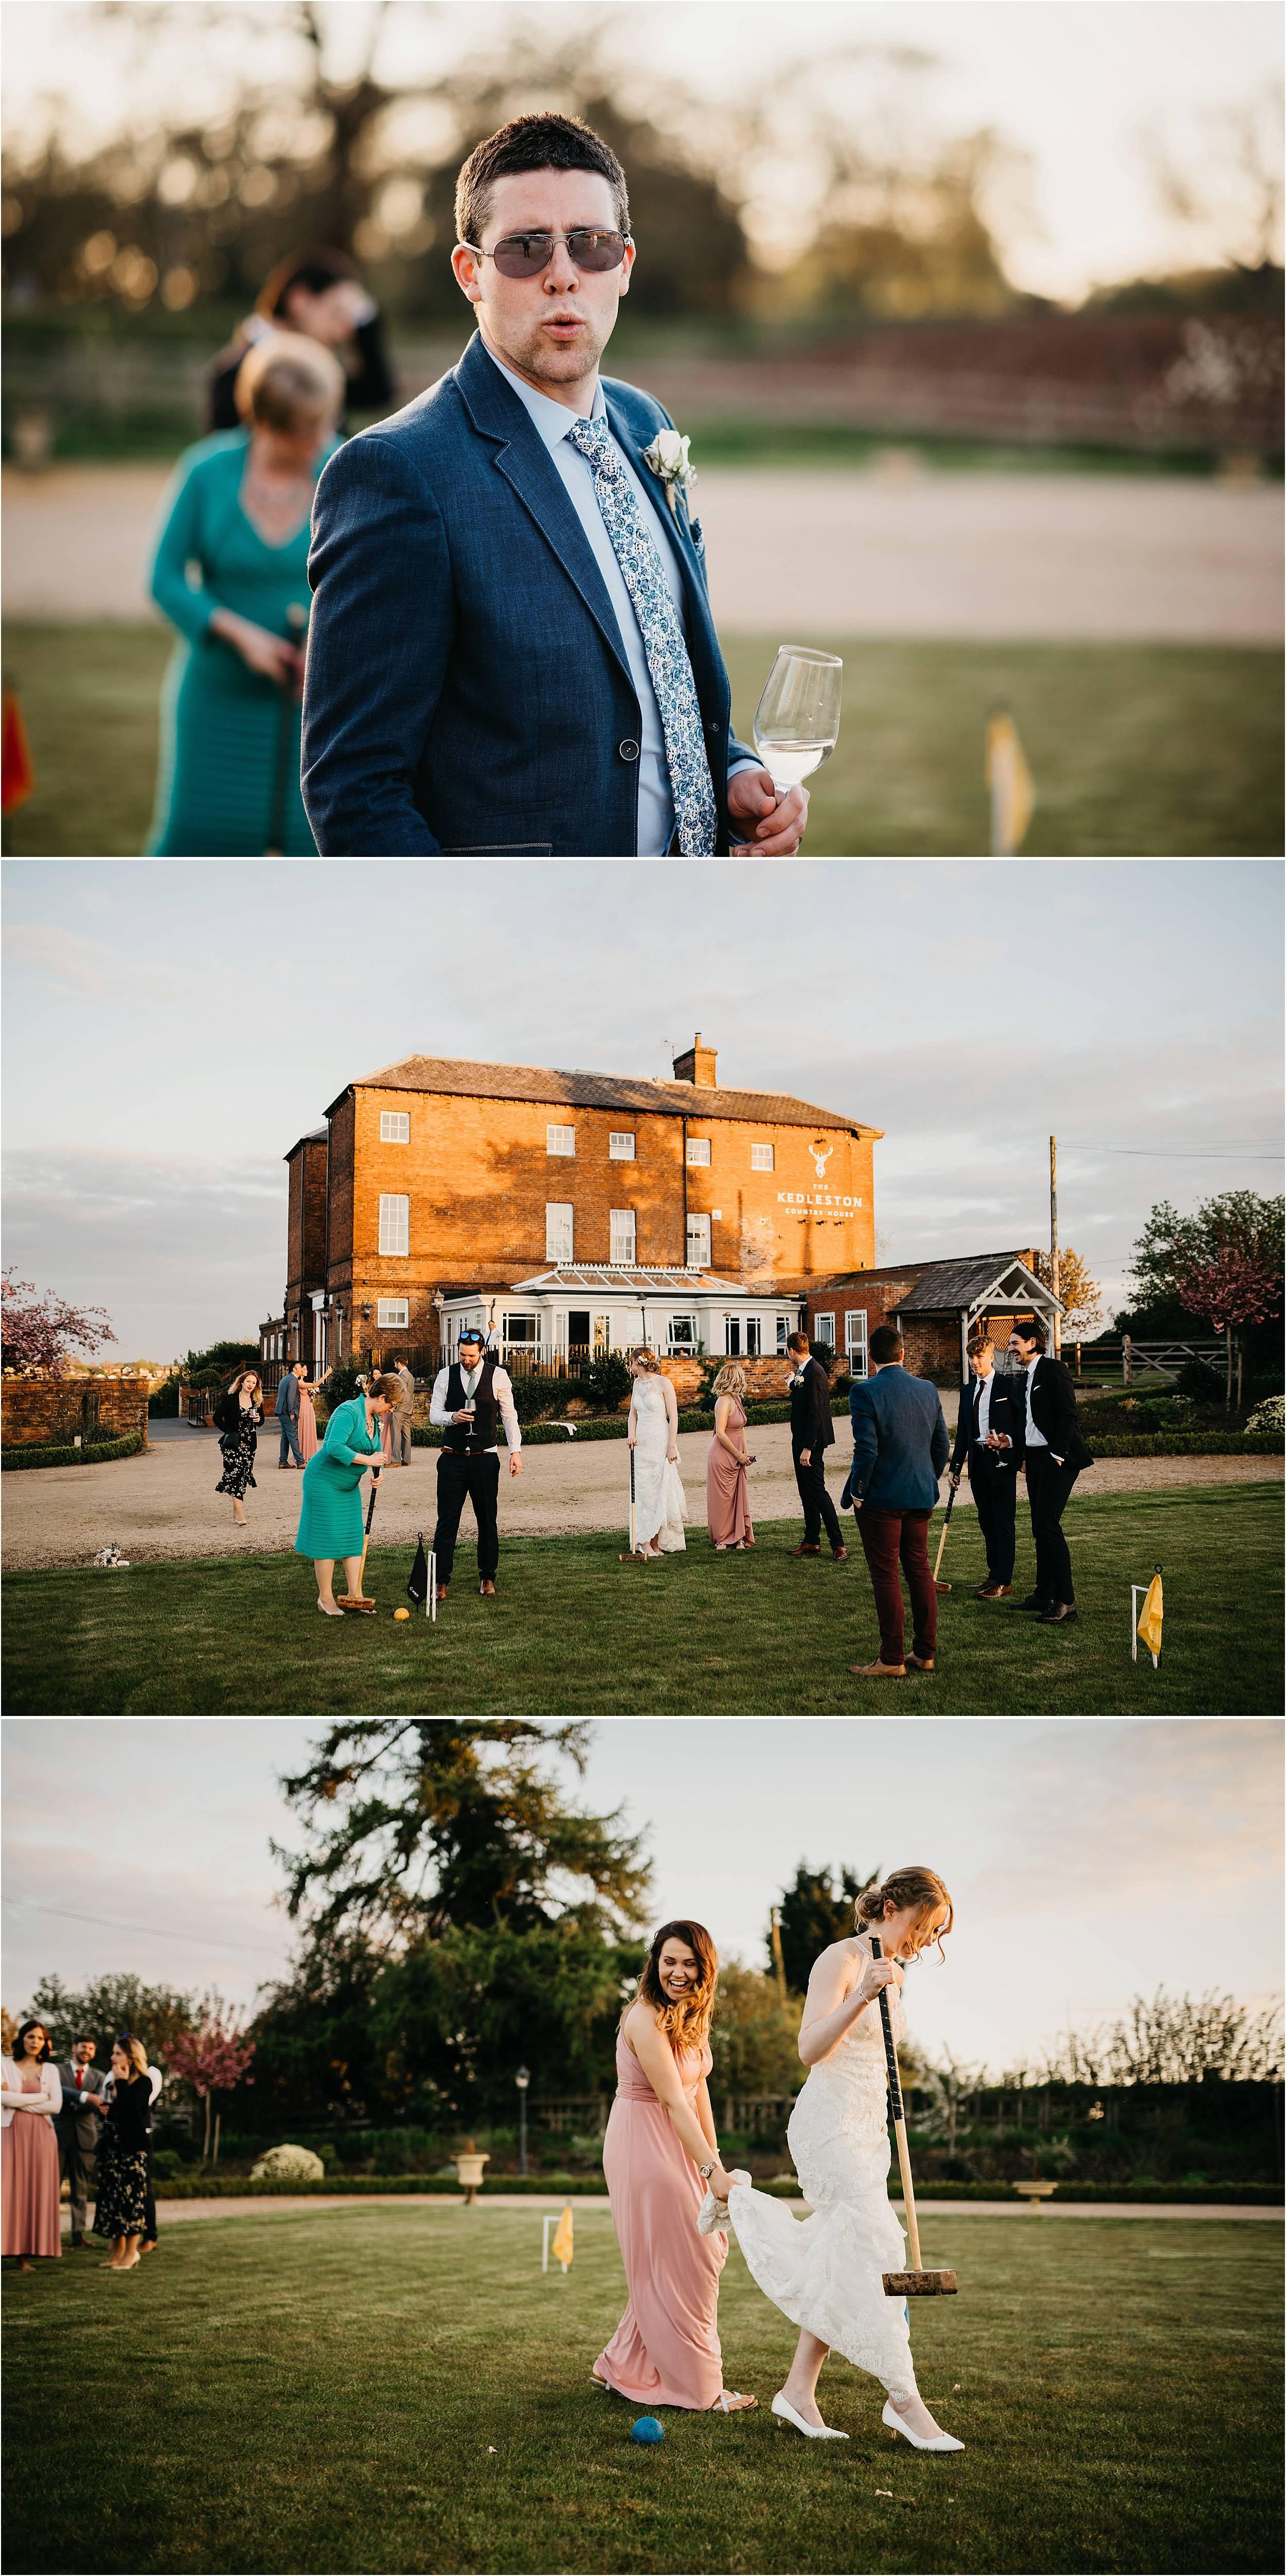 Kedleston Country House Wedding Photography_0101.jpg